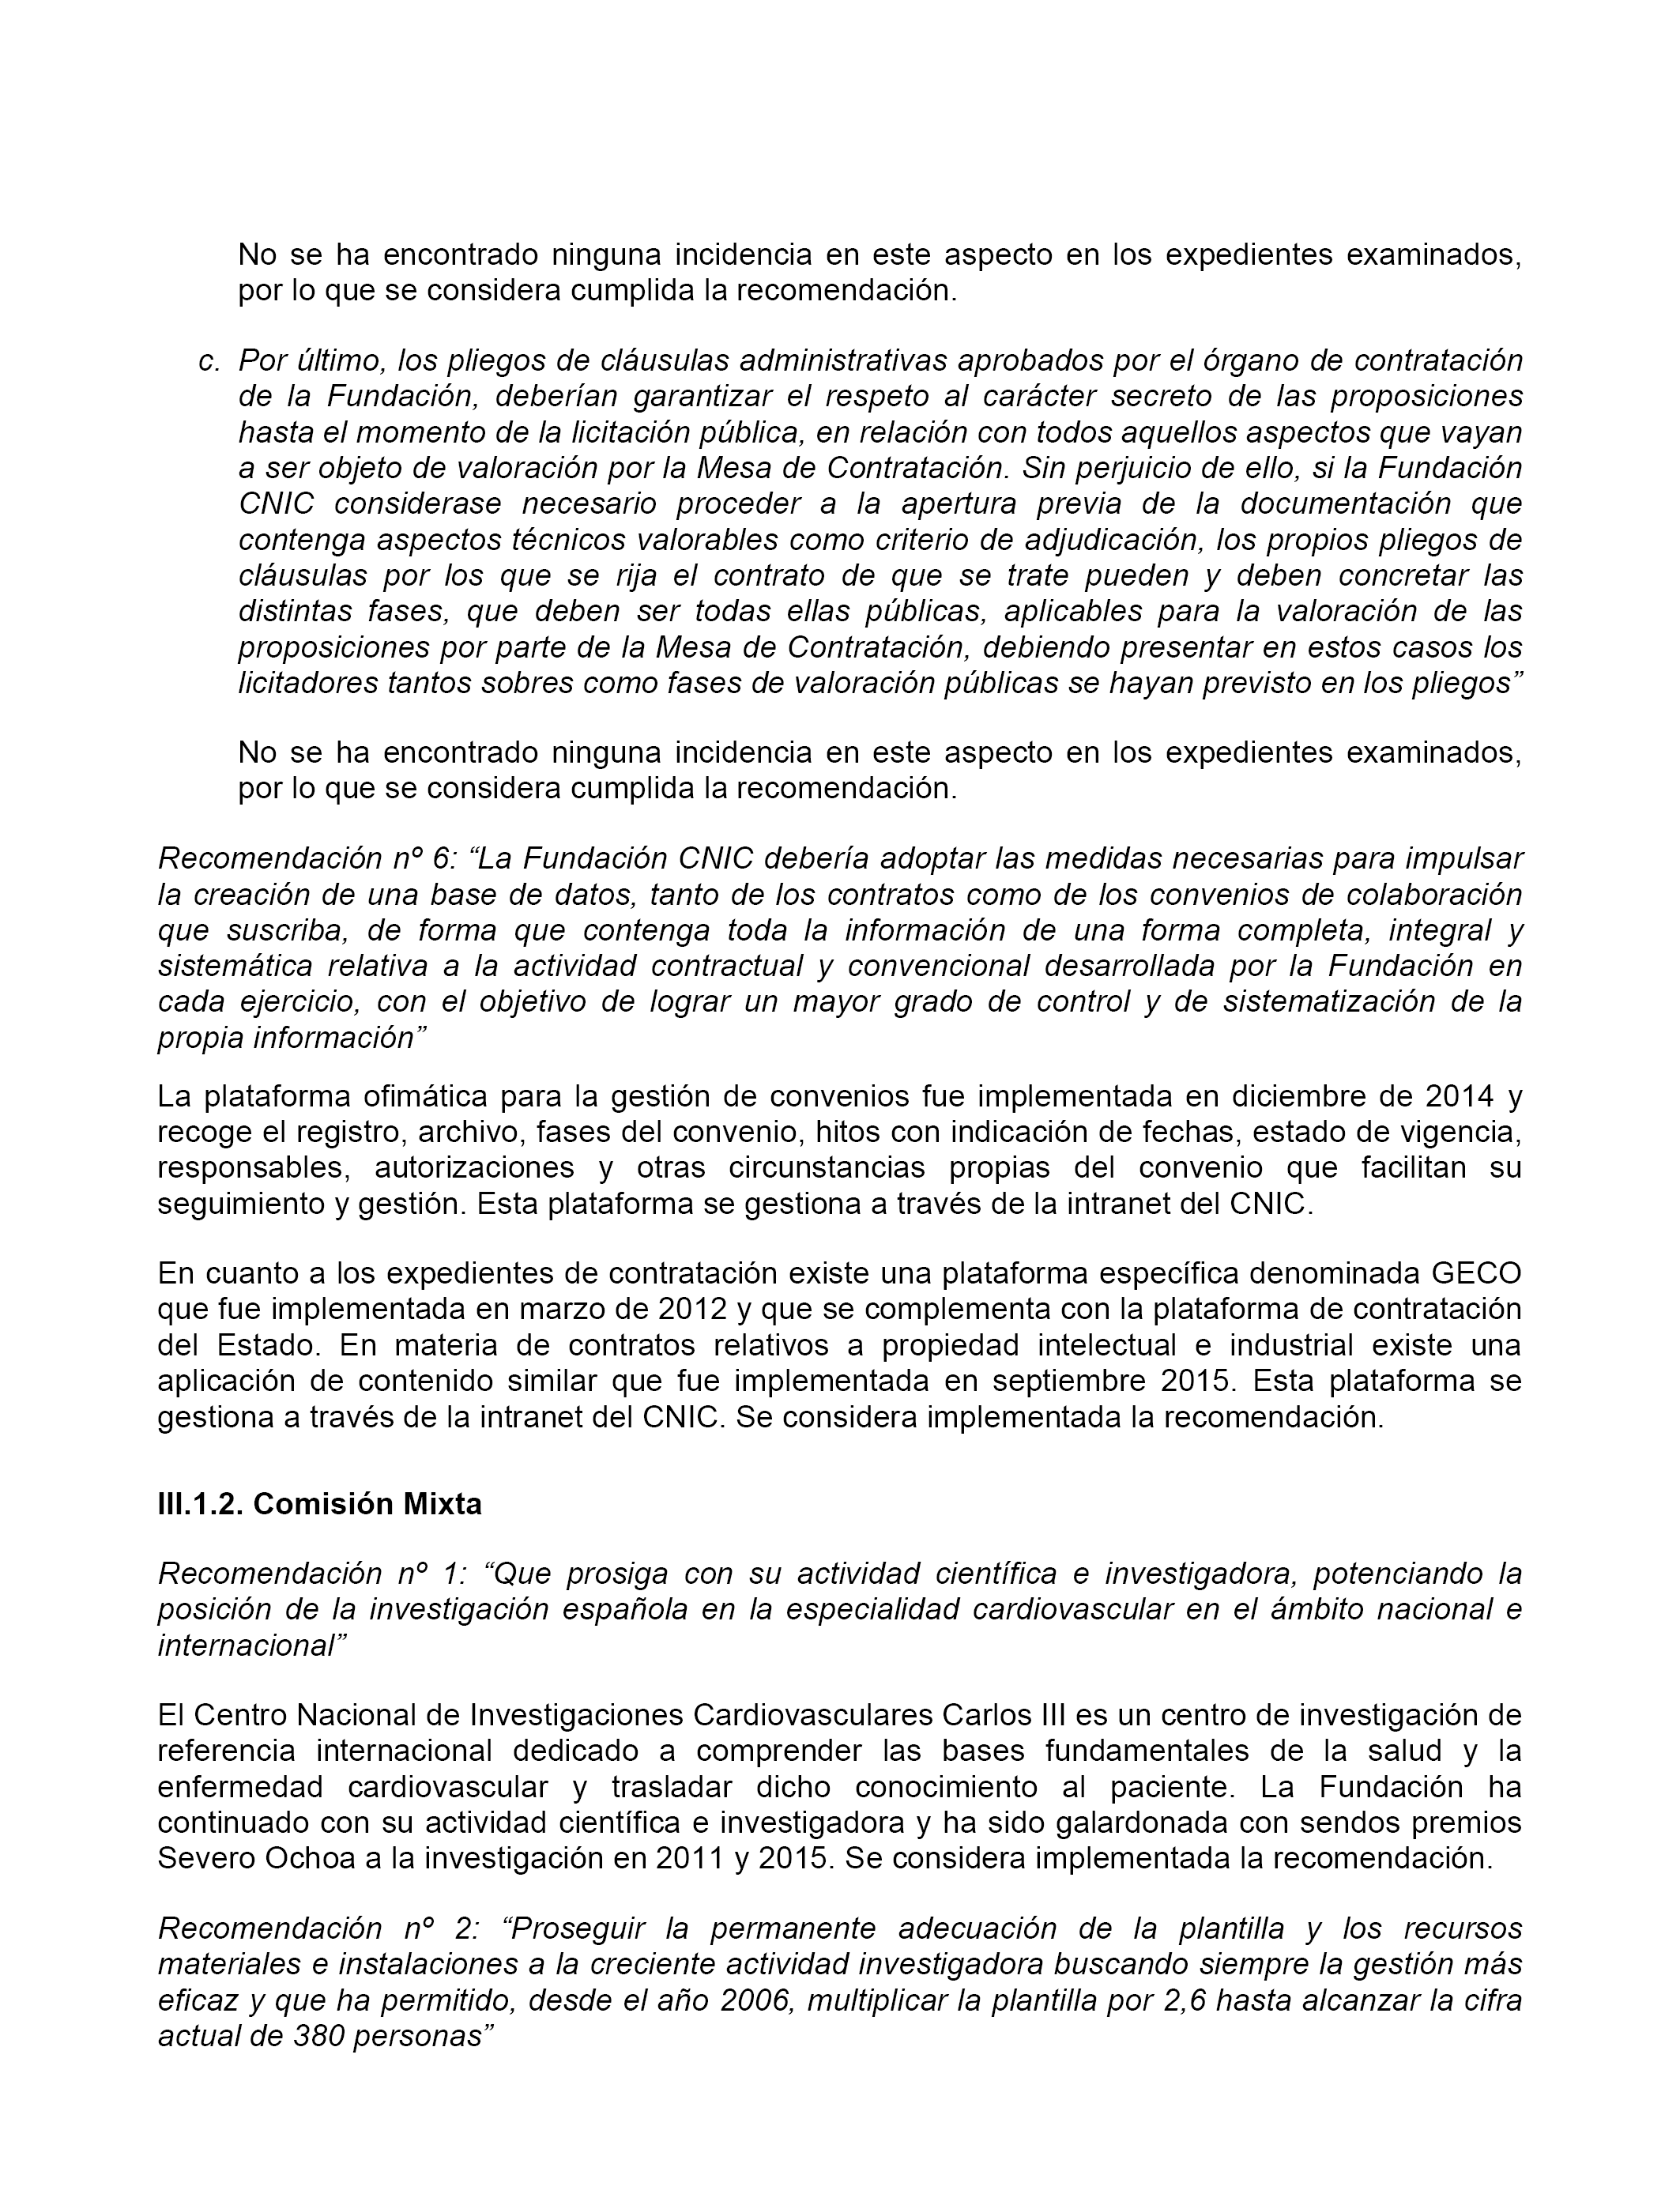 BOE.es - Documento BOE-A-2017-9397